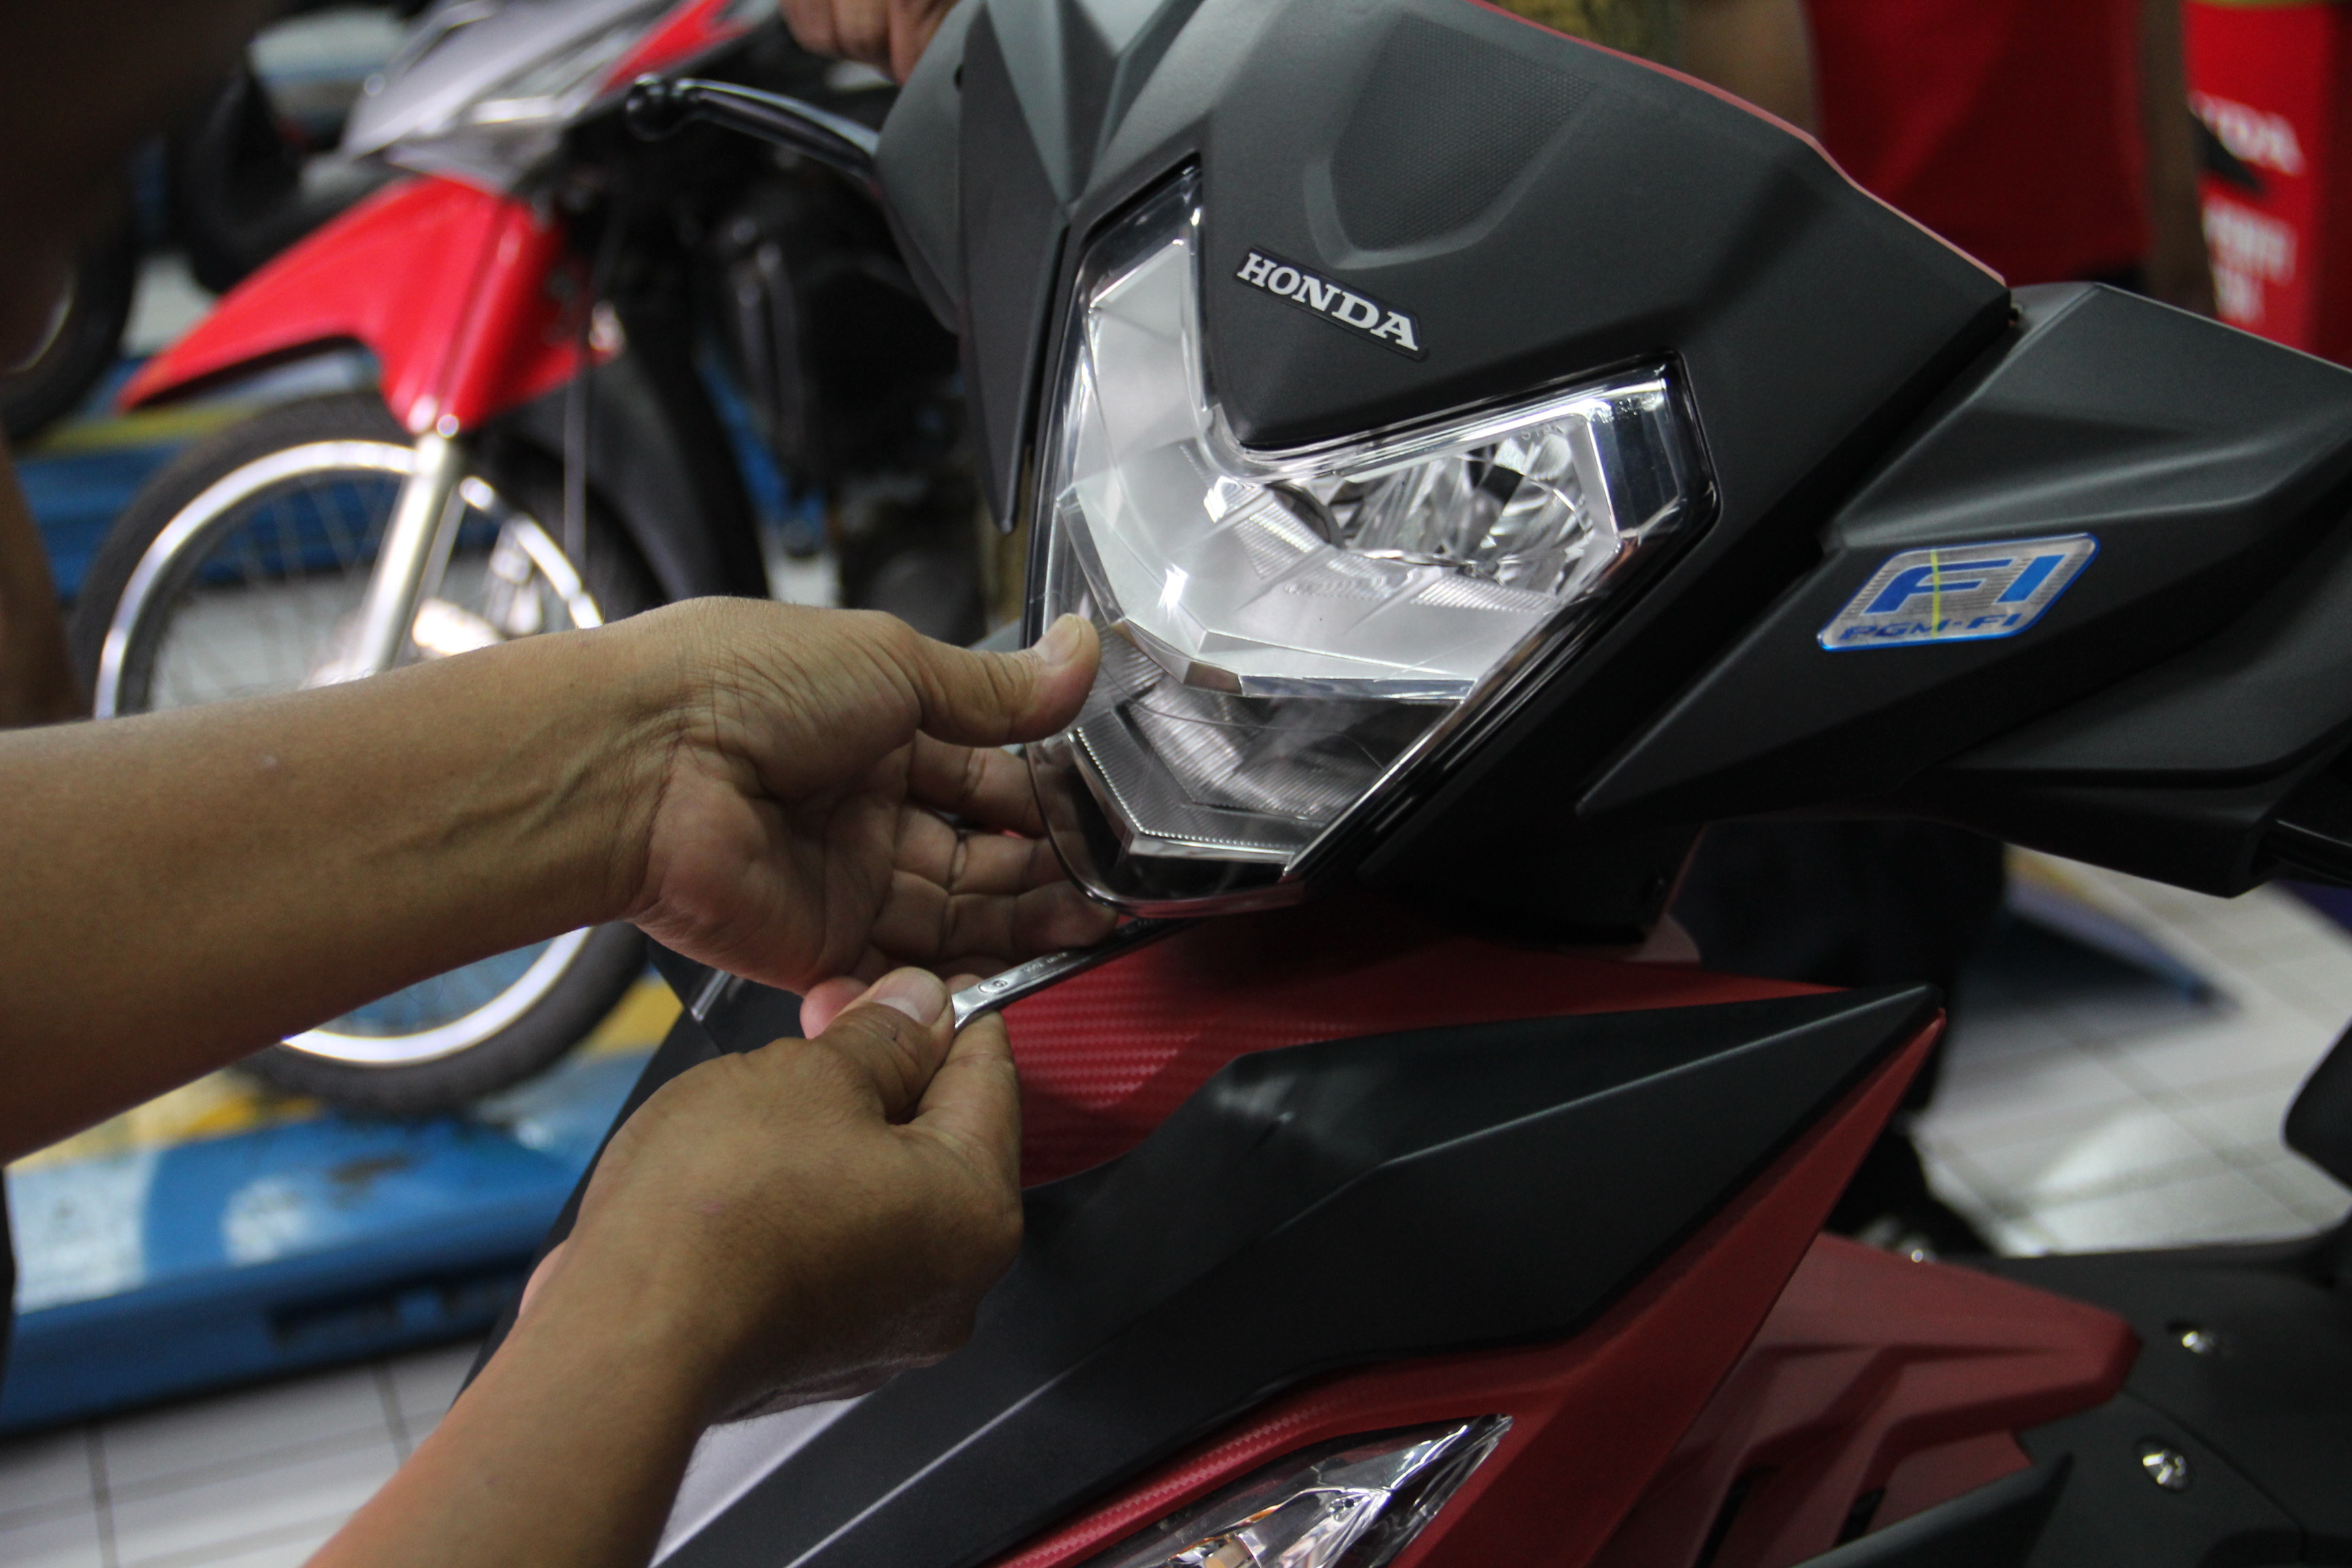 Yuk Setel Ketinggian Headlamp New Honda Sonic 150R dan Supra GTR 150 Sendiri